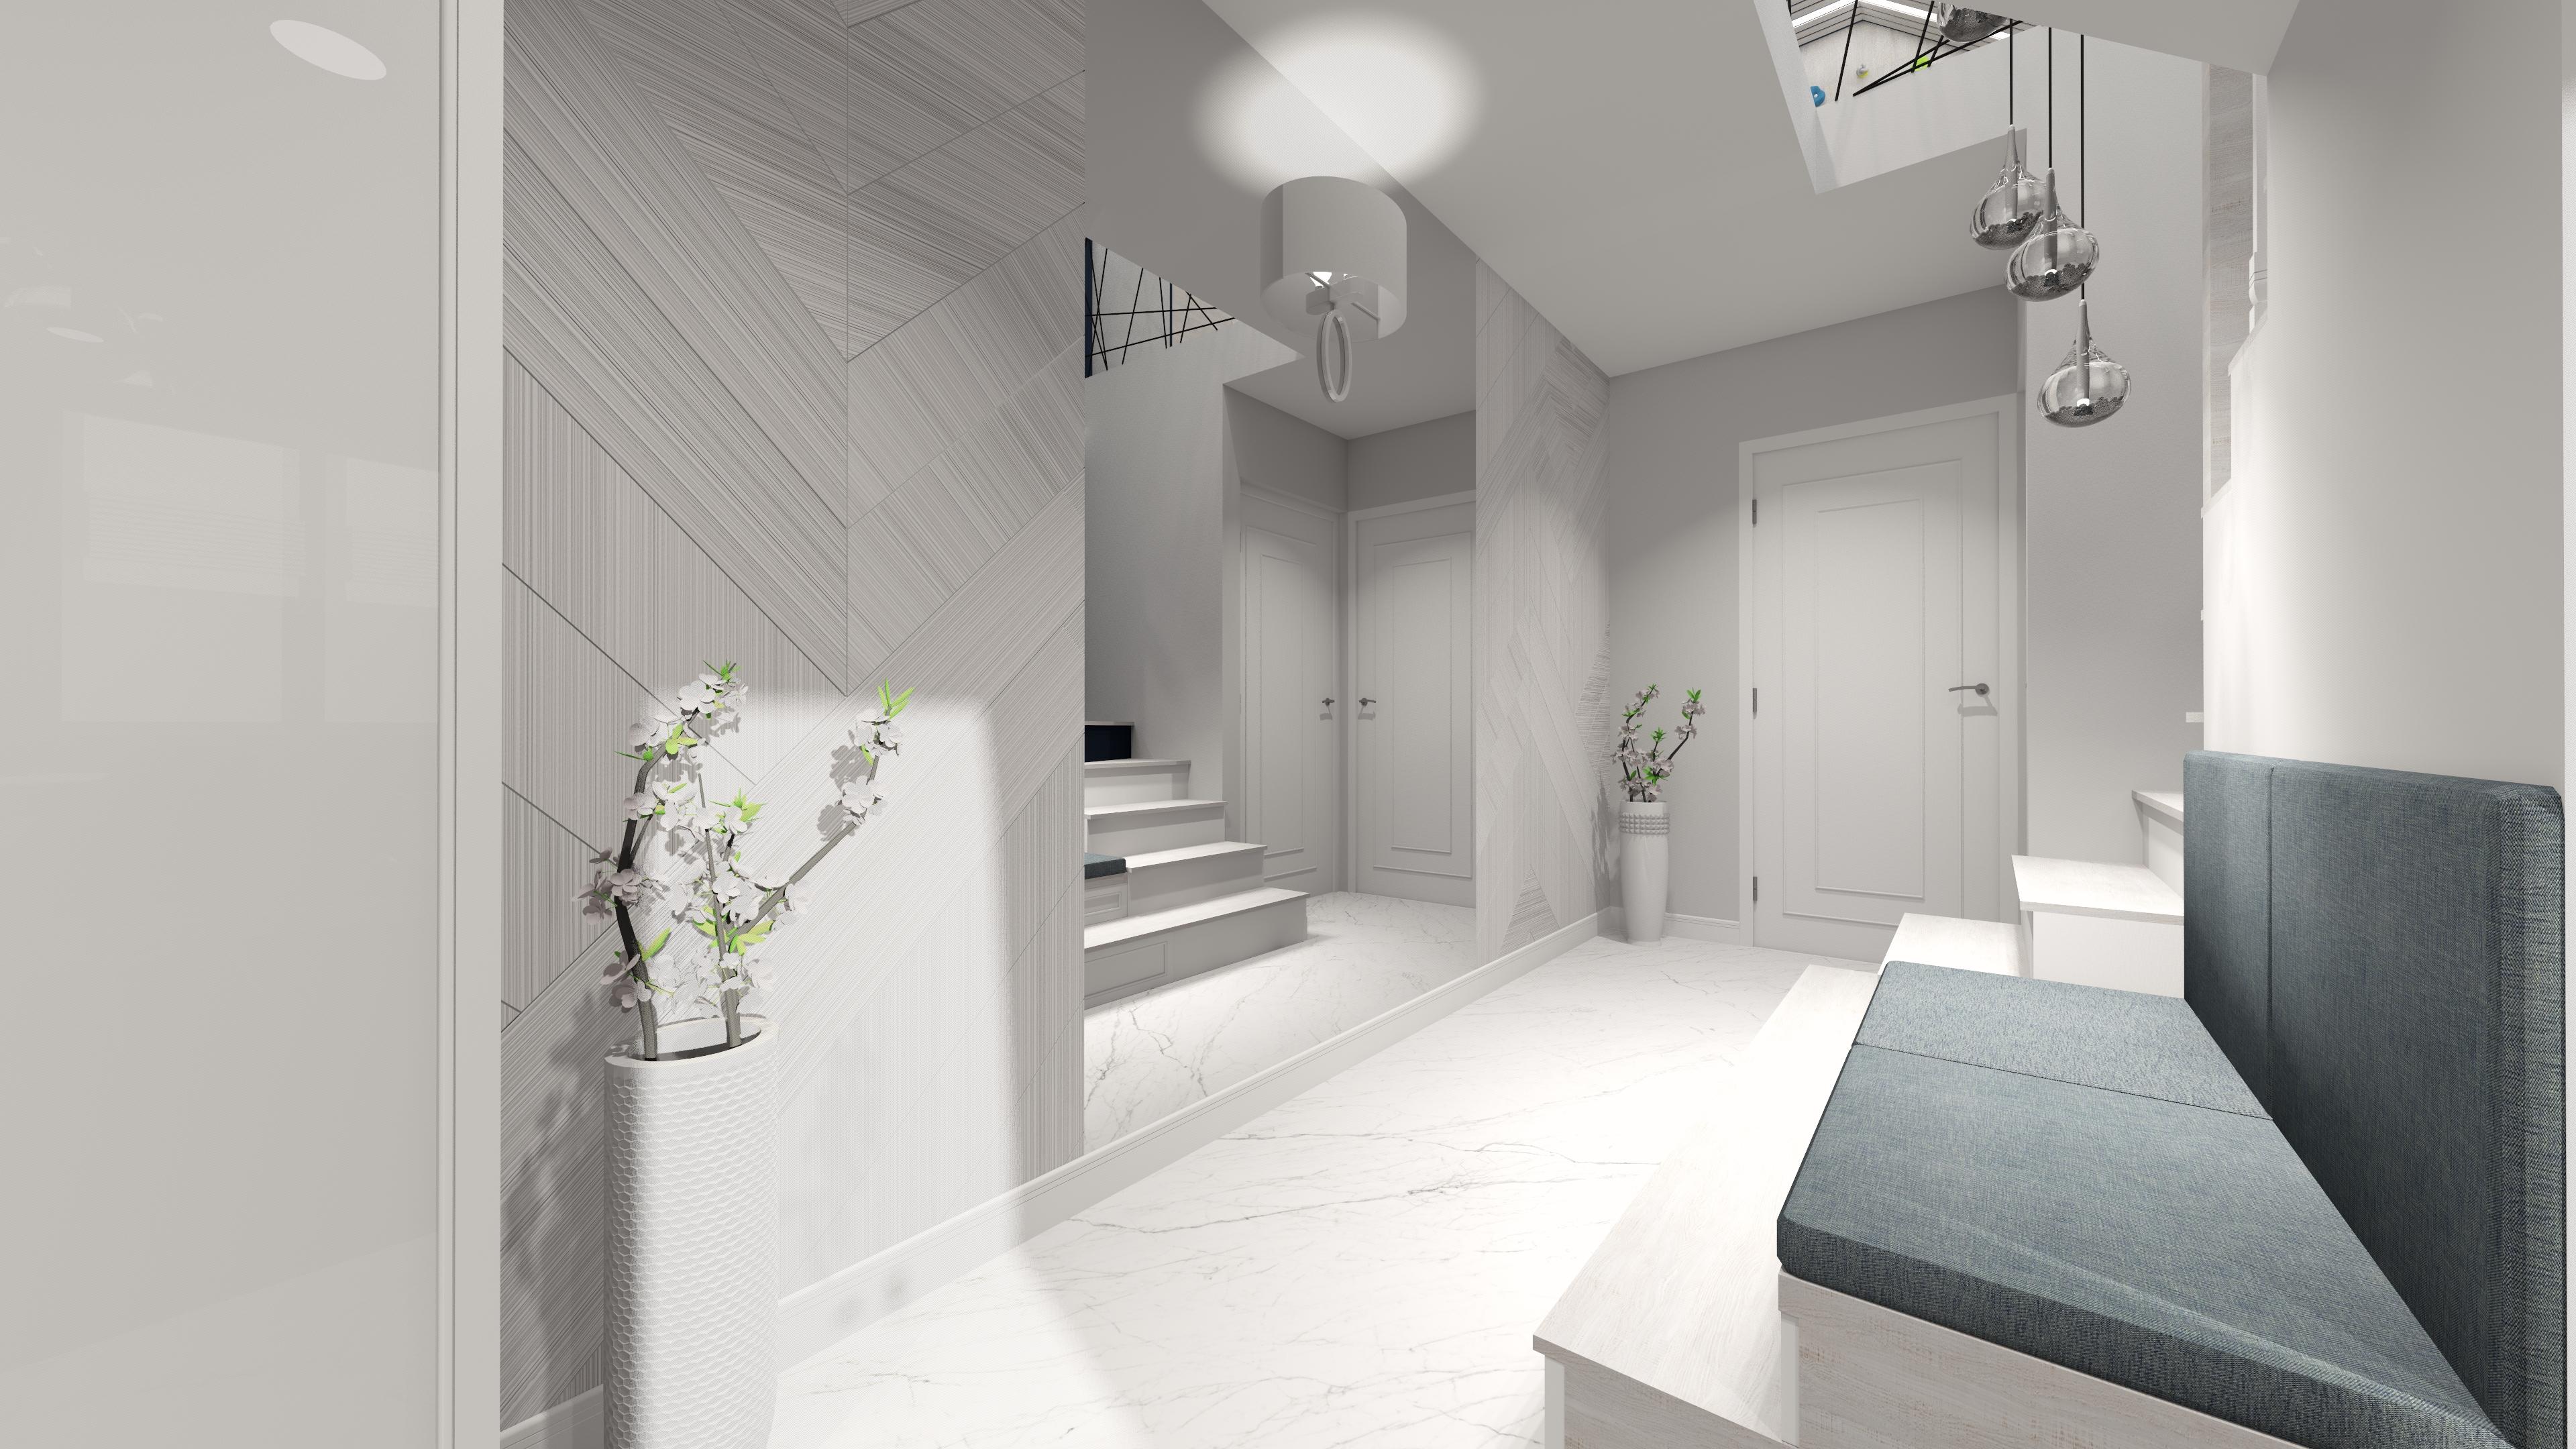 projektantpulawy-pulawy-czapla-interior-design-entresol-modern-steel-small-room-kitchenROZ1